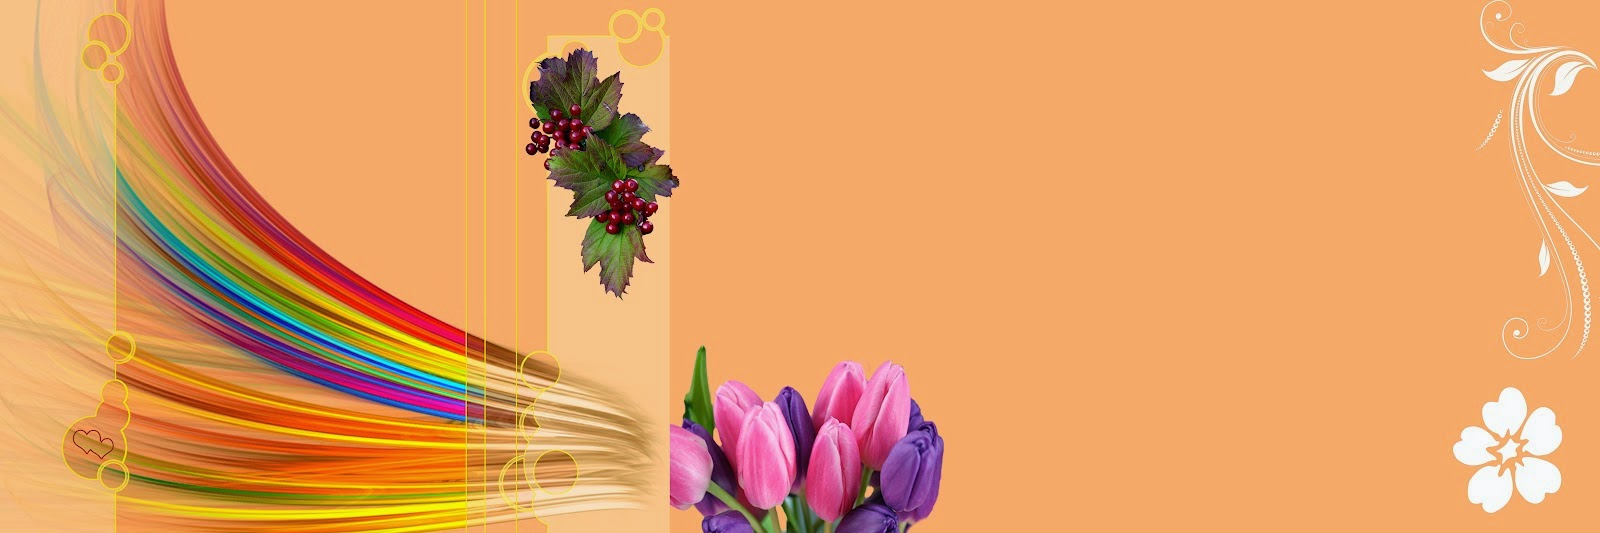 High Resolution Wedding Album Backgrounds Backgrounds For Wedding Album